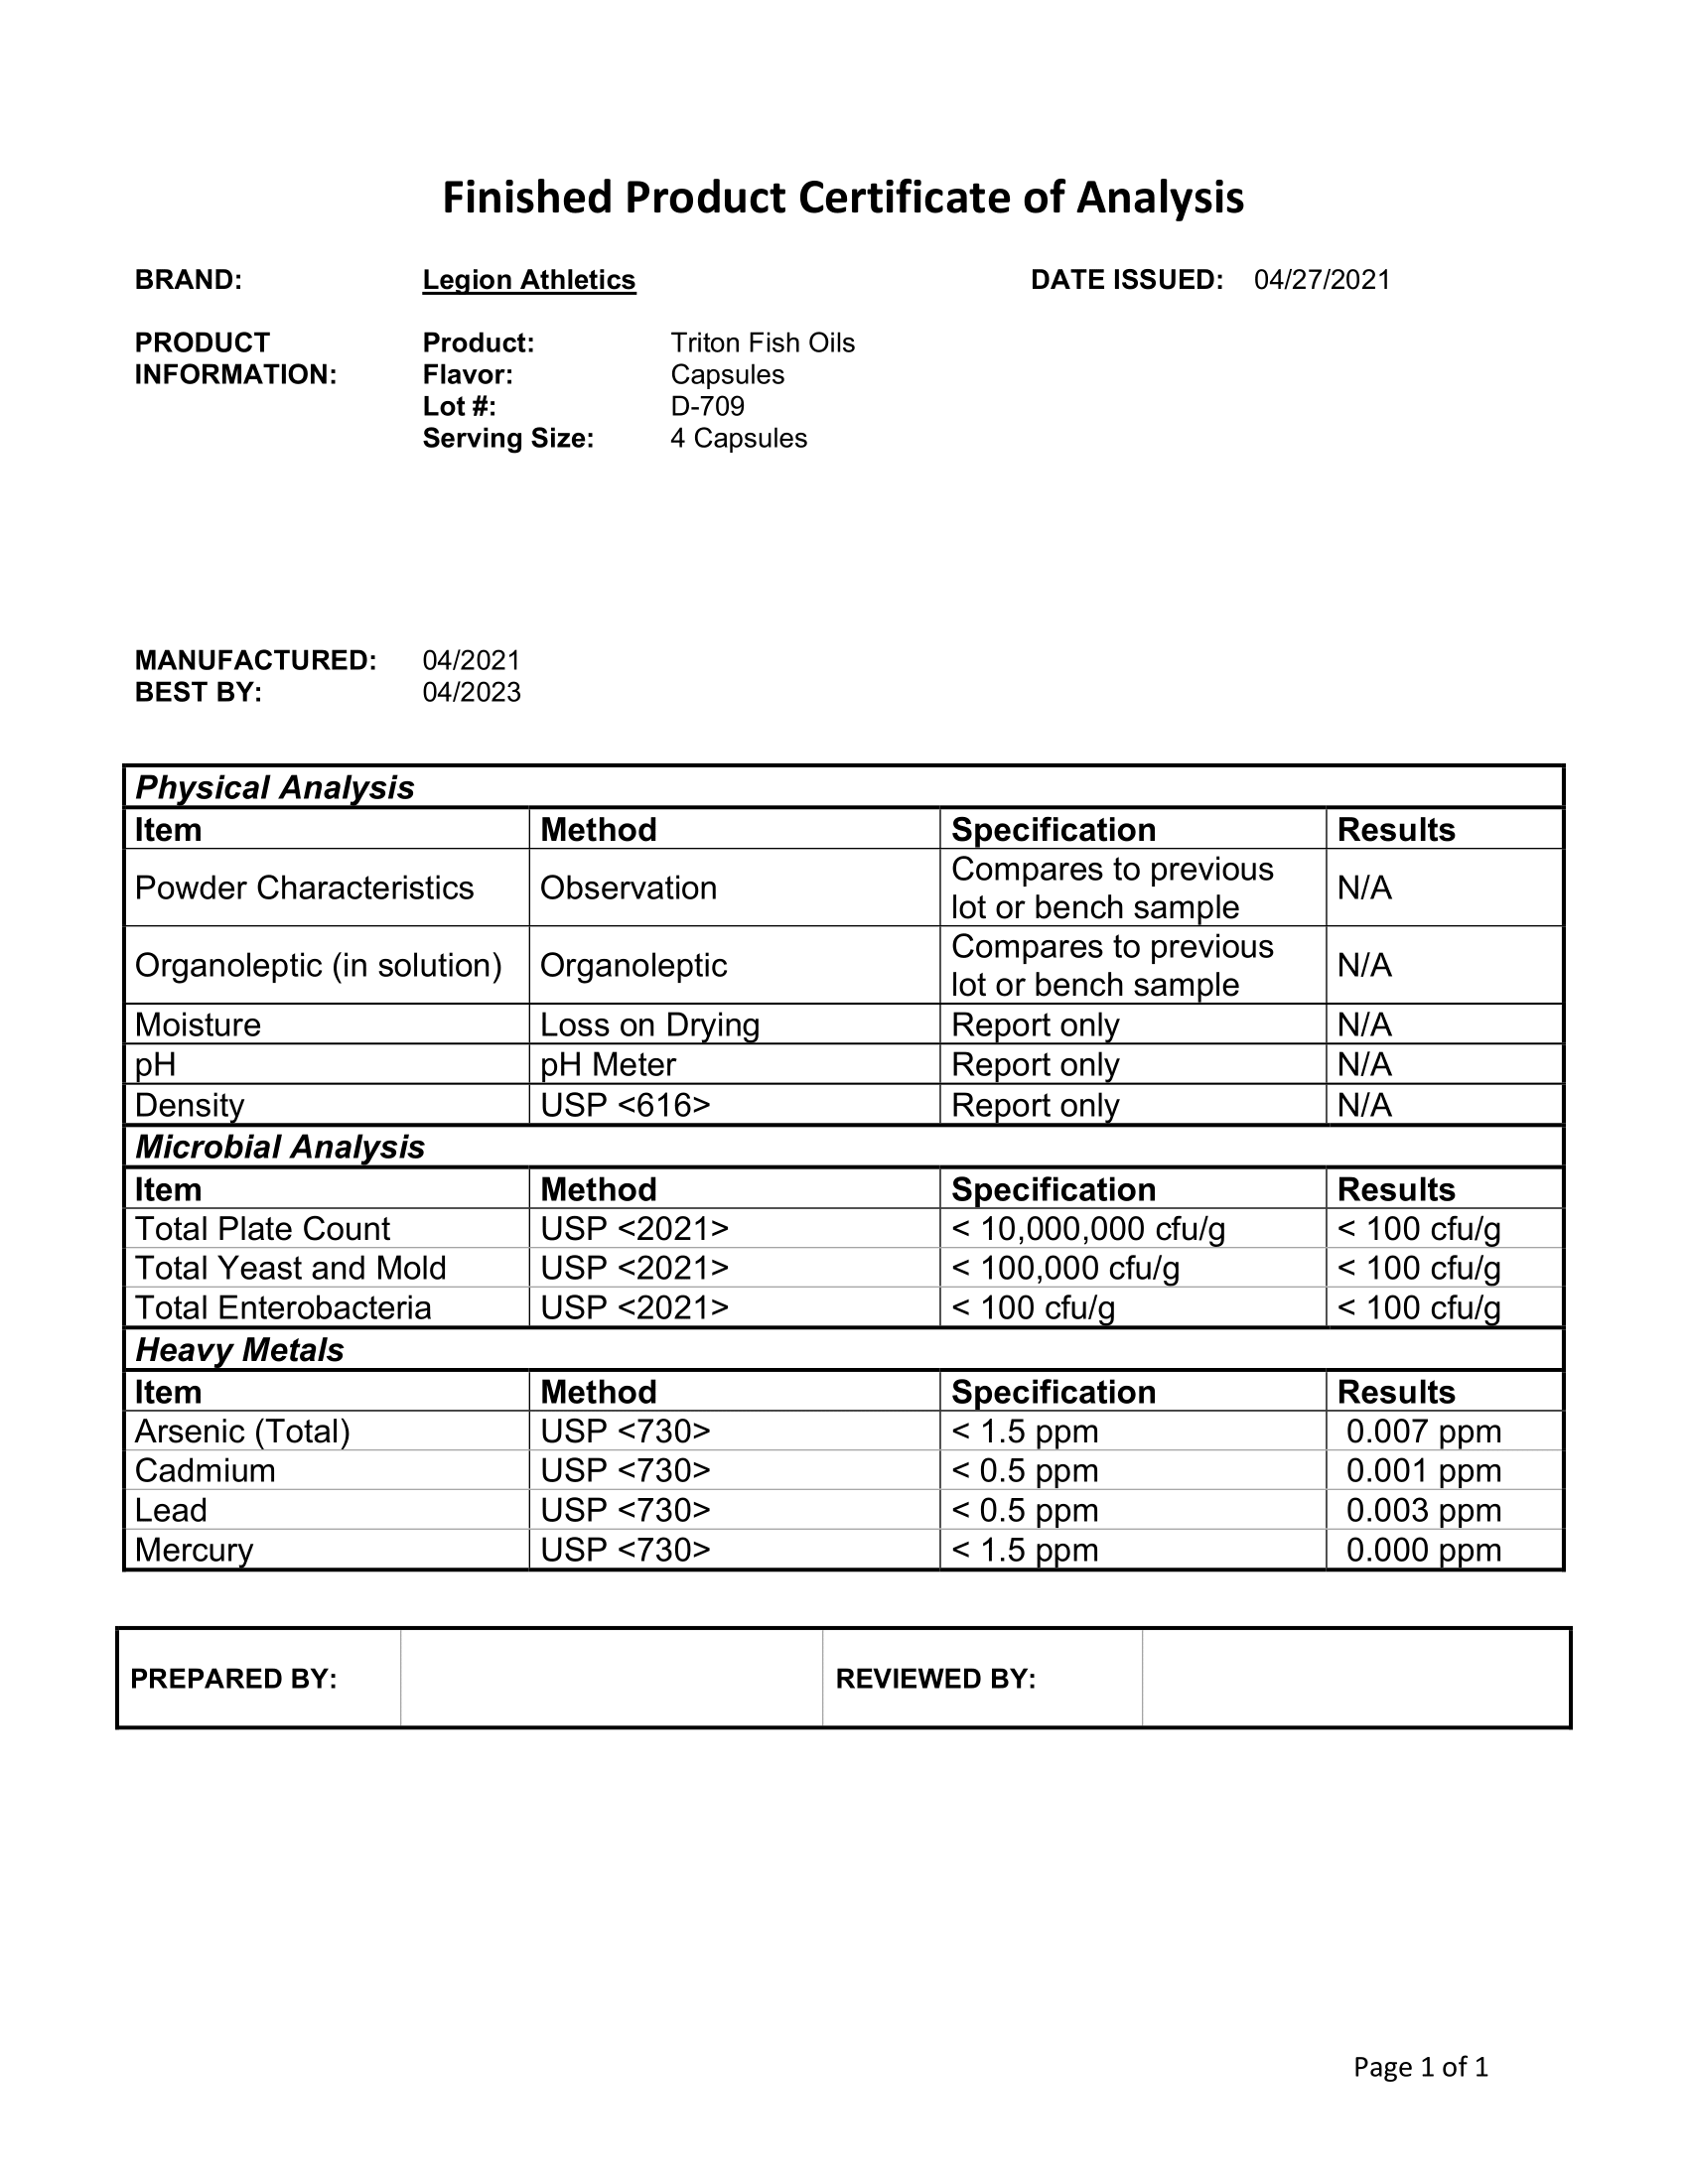 Triton Lab Test Certificate